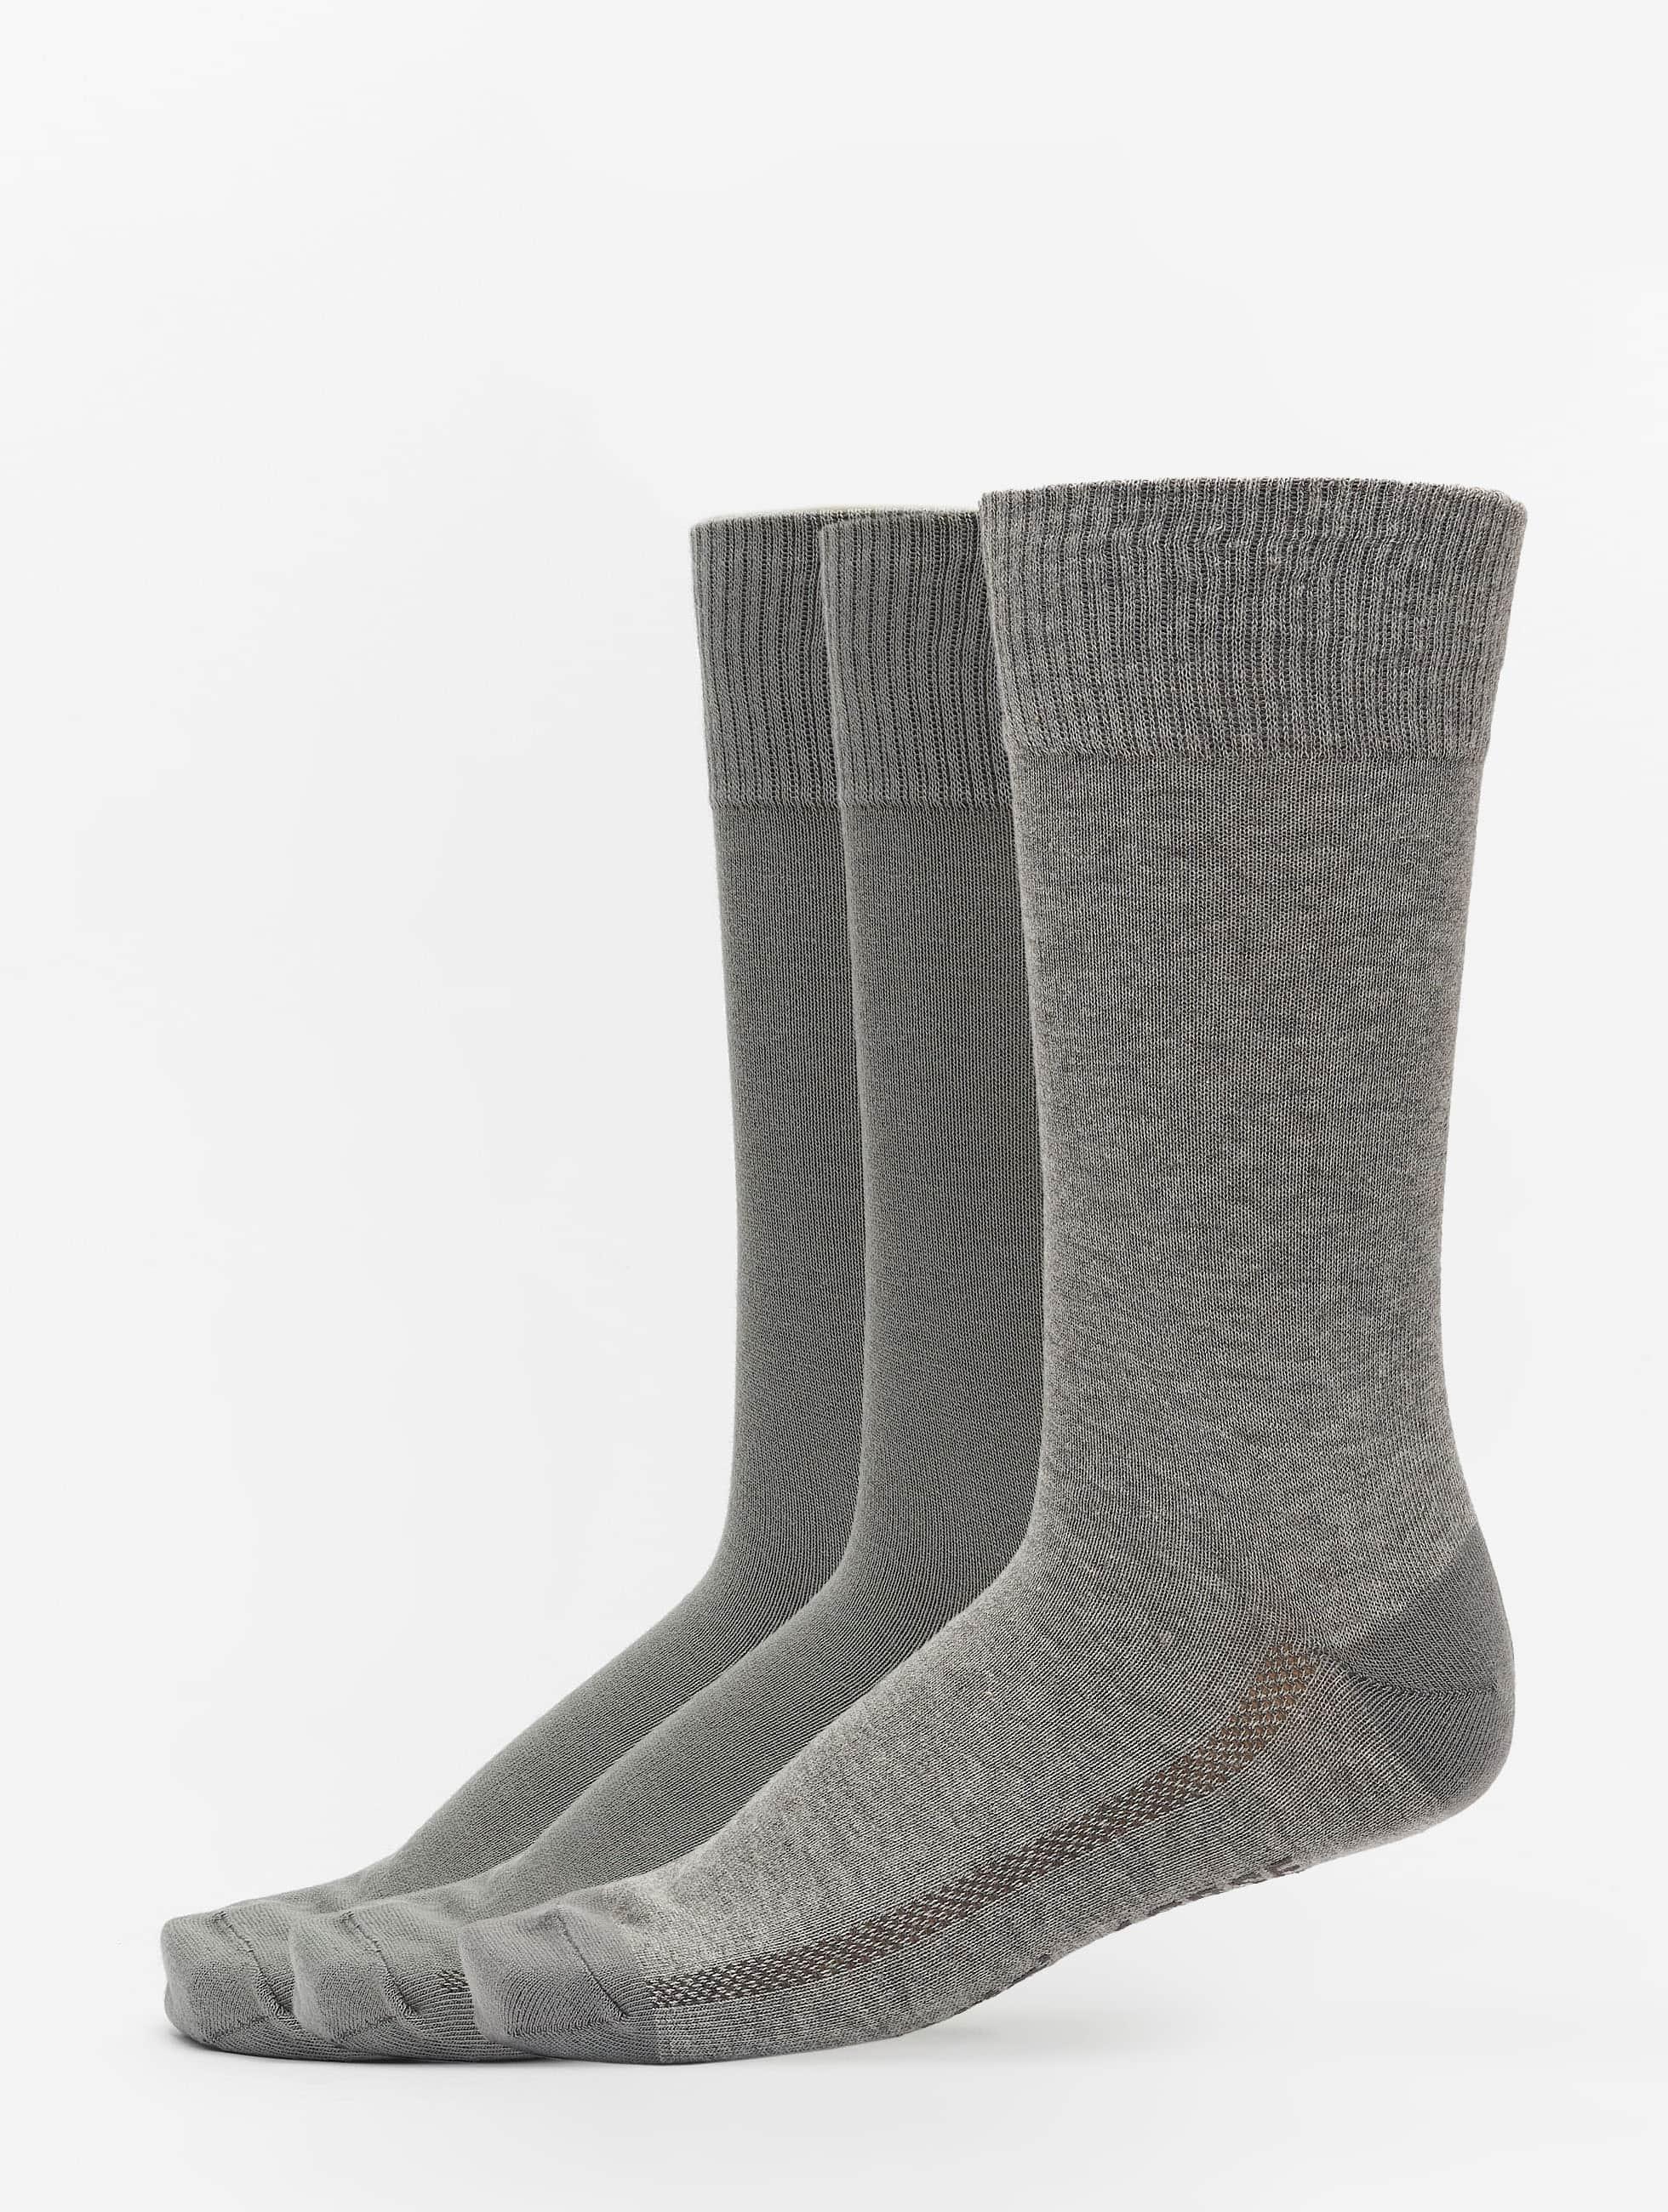 Gablenz Angebote Levi´s Männer,Frauen Socken Regular Cut in grau